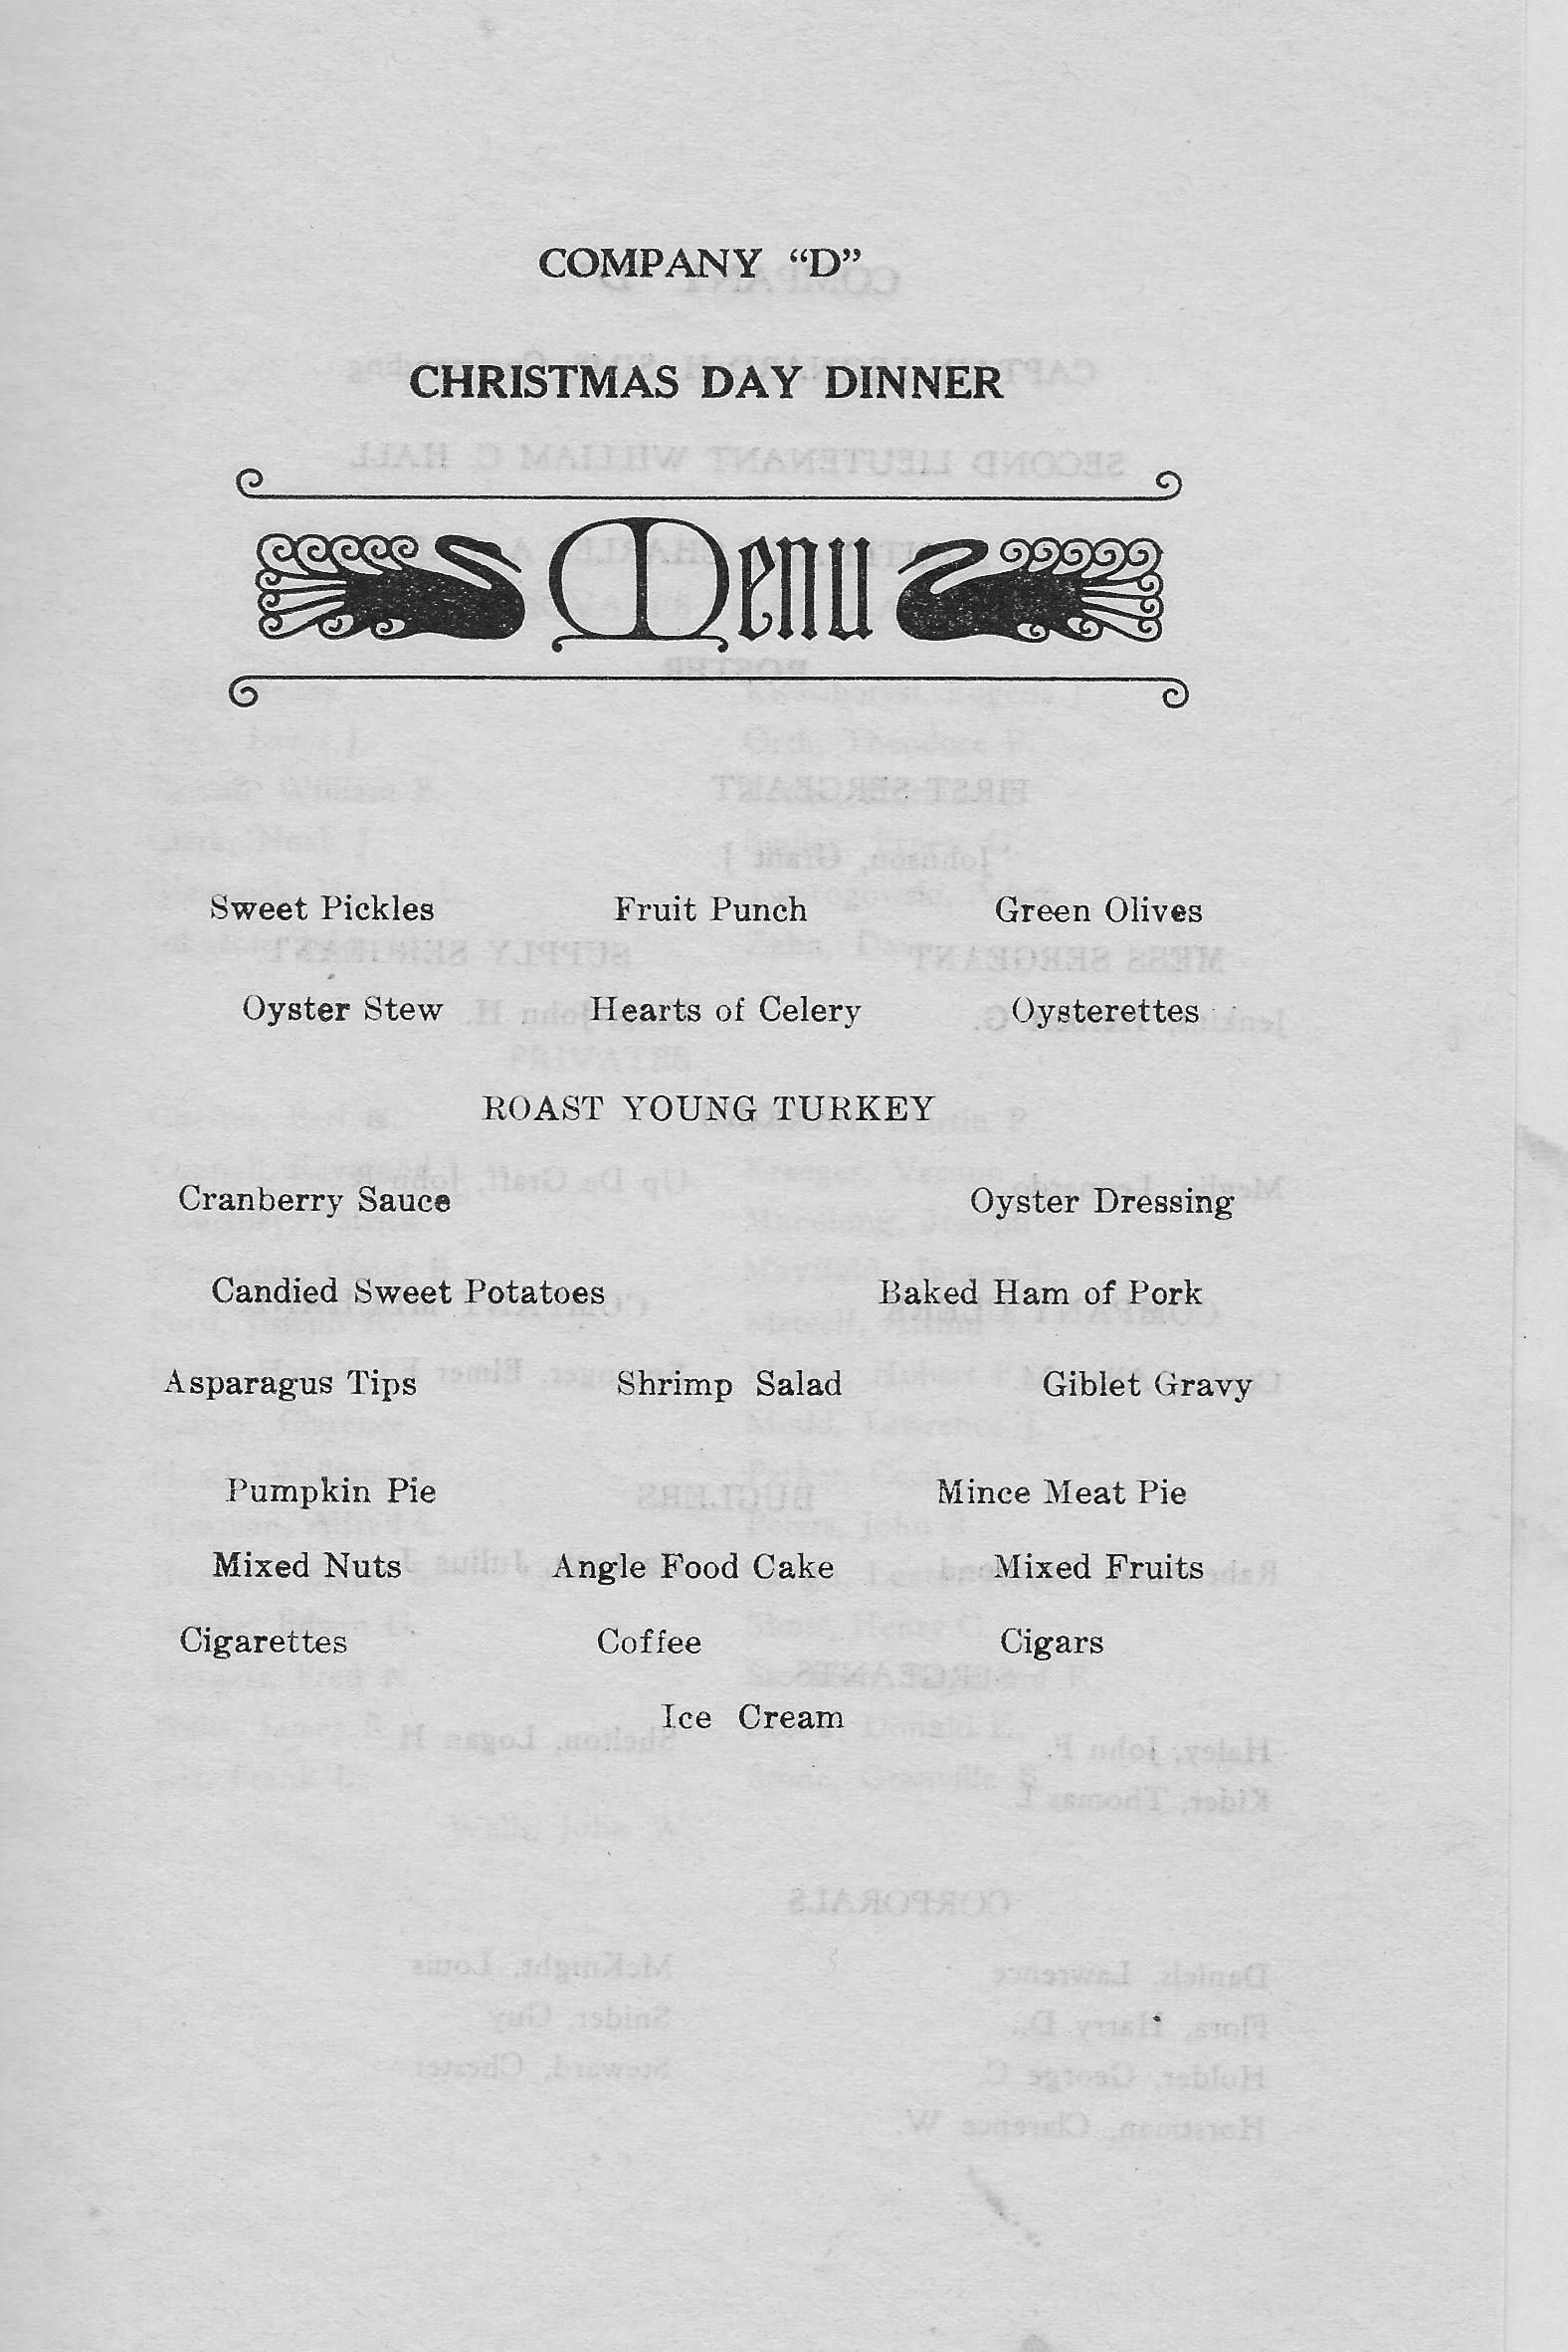 1934 Menu - Shrimp Salad